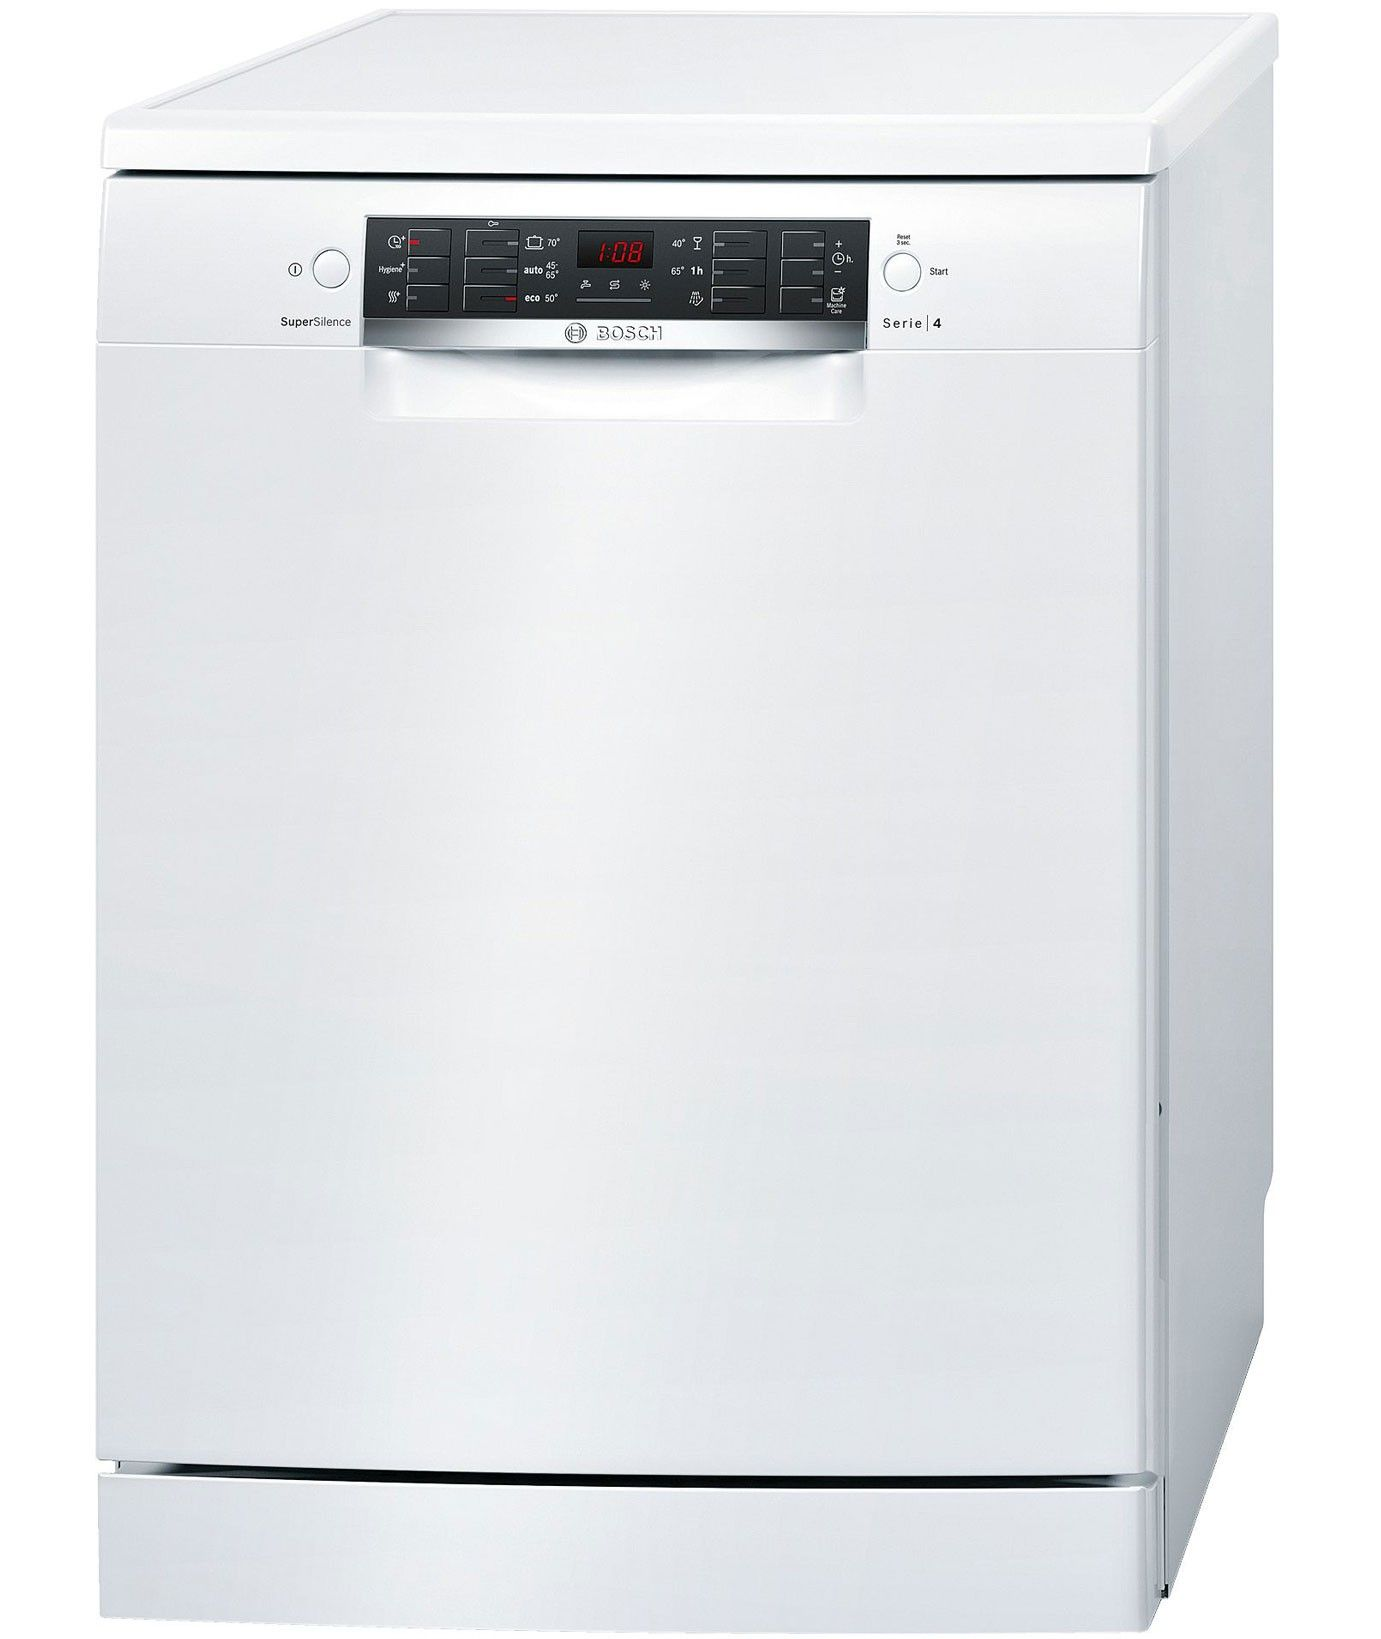 Pin By Moltikala On Bosch Washing Machin Bosch Dishwashers Home Appliances Washing Machine